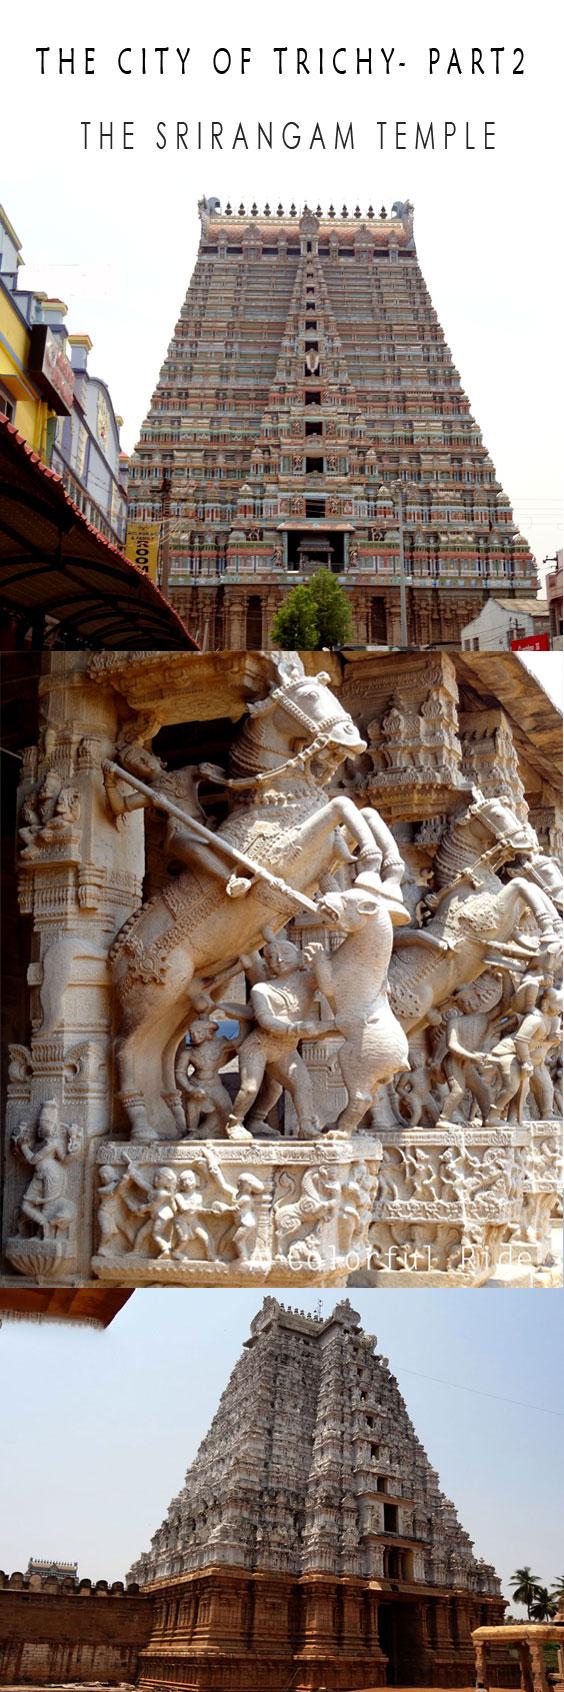 Trichy Srirangam temple